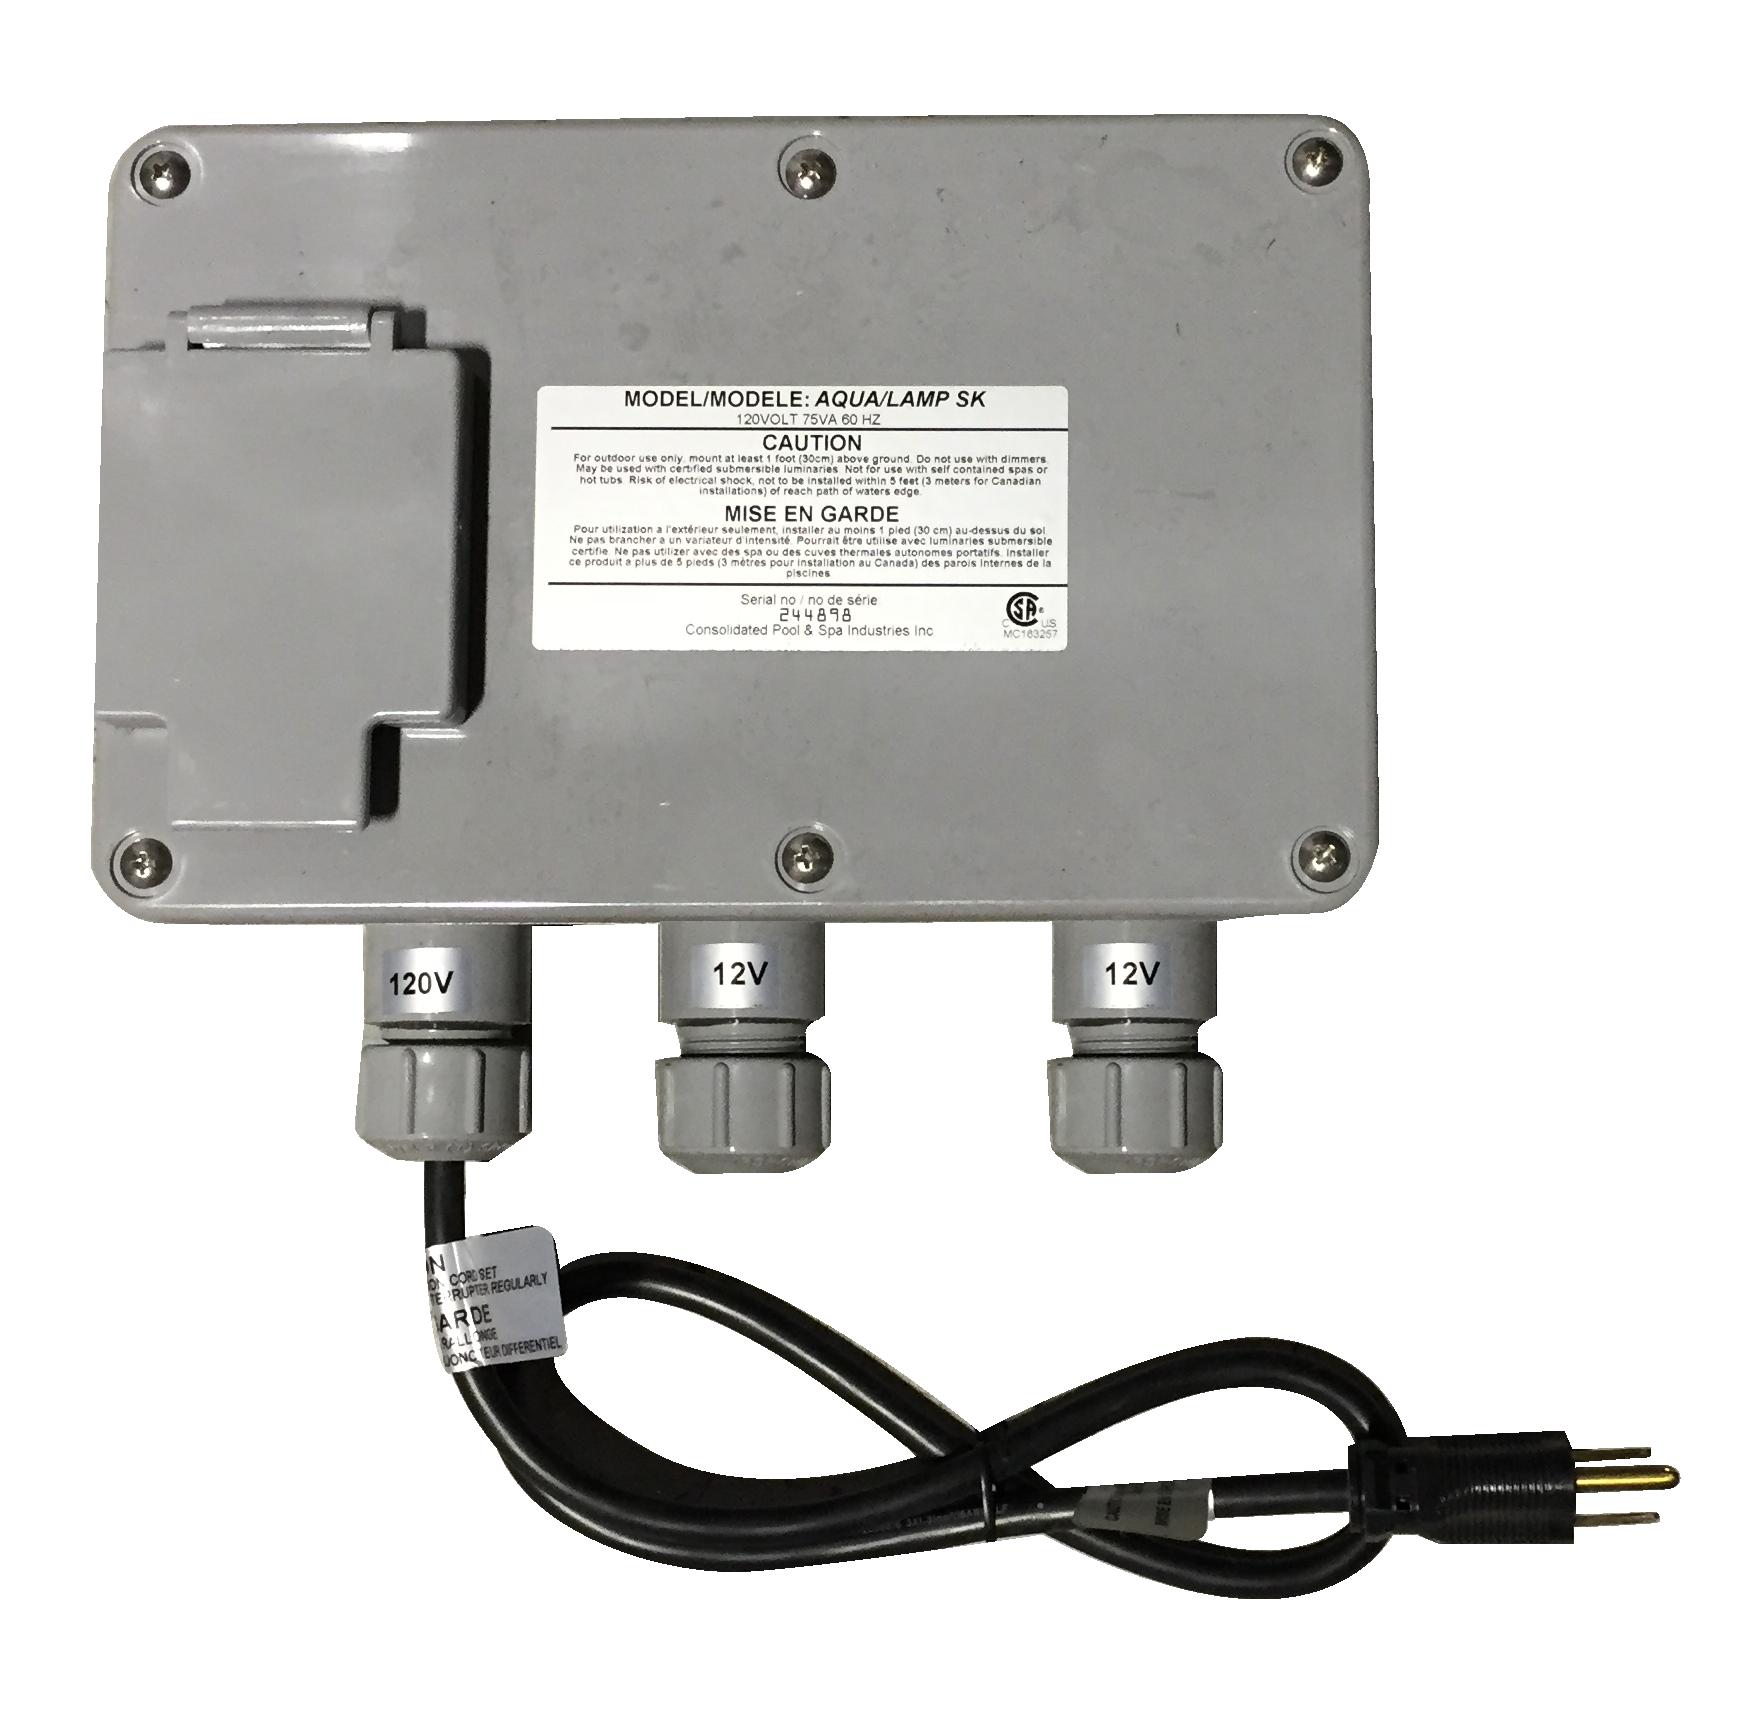 Aqualamp Or Rainbow Rays Dual Transformer Box Pool Supplies Canada Wiring A Hot Tub Complete